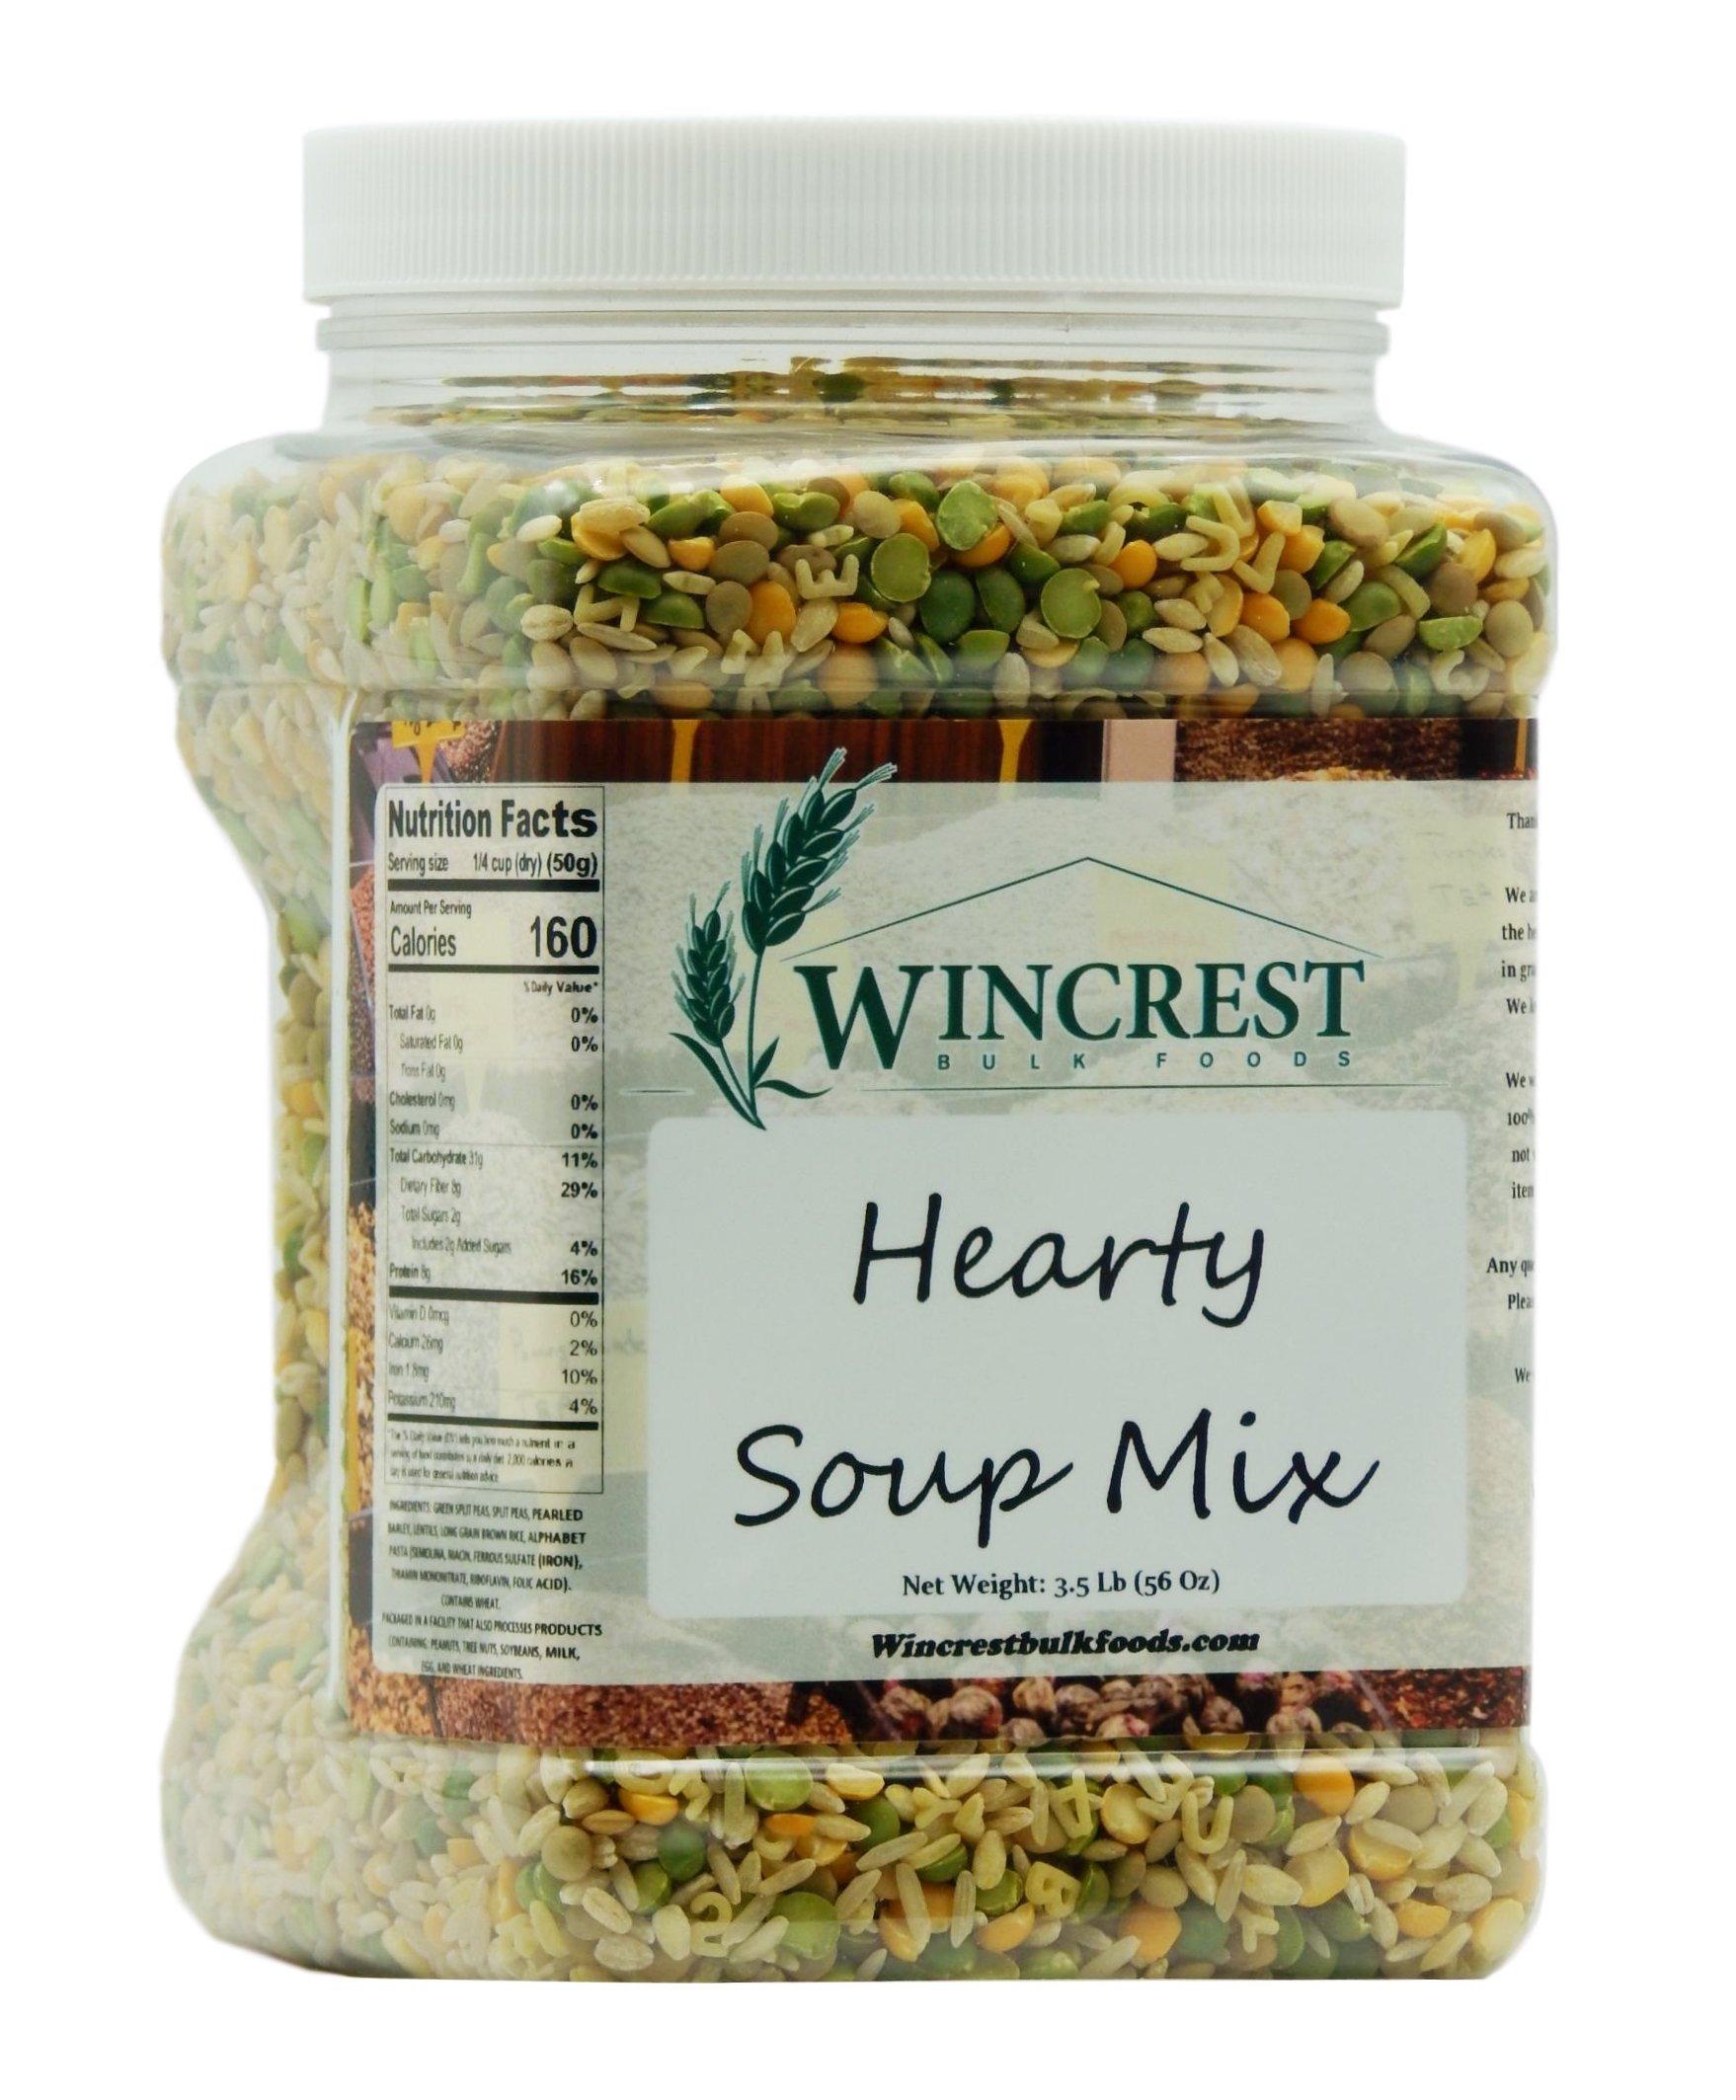 Hearty Soup Mix - 3.5 Lb (56 Oz) Tub